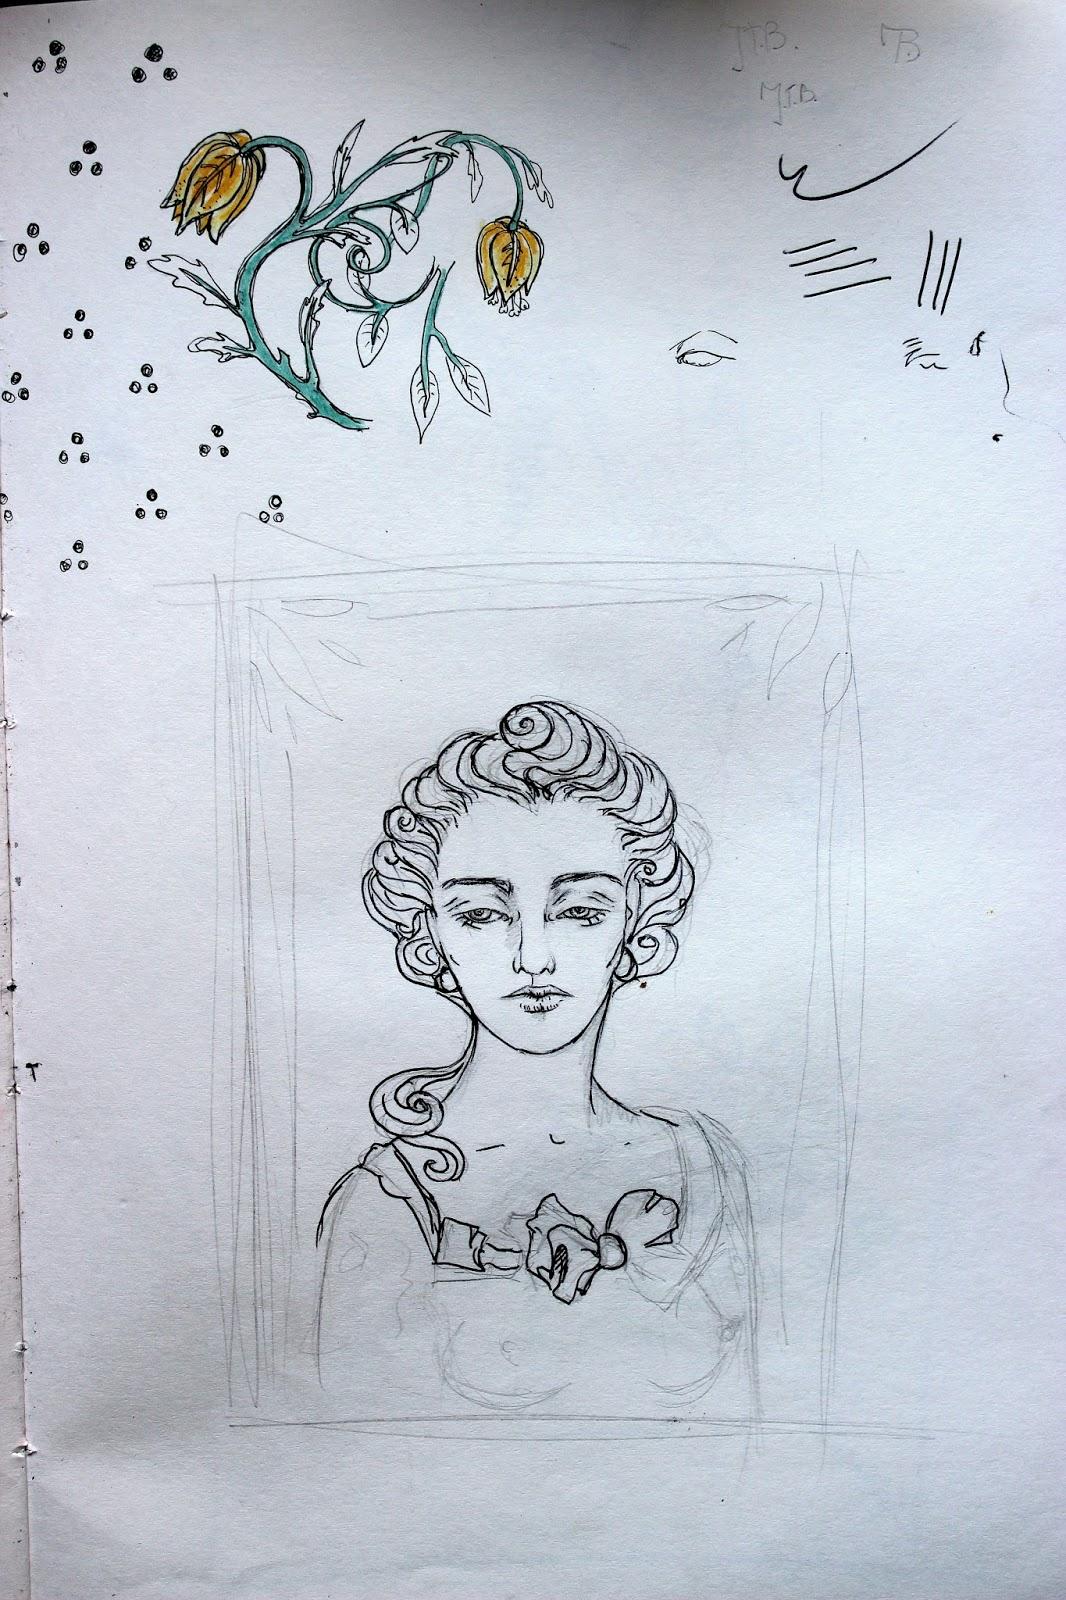 Sketchpad Notebook Sketch Drawing Pencil Pen Lady Flowers